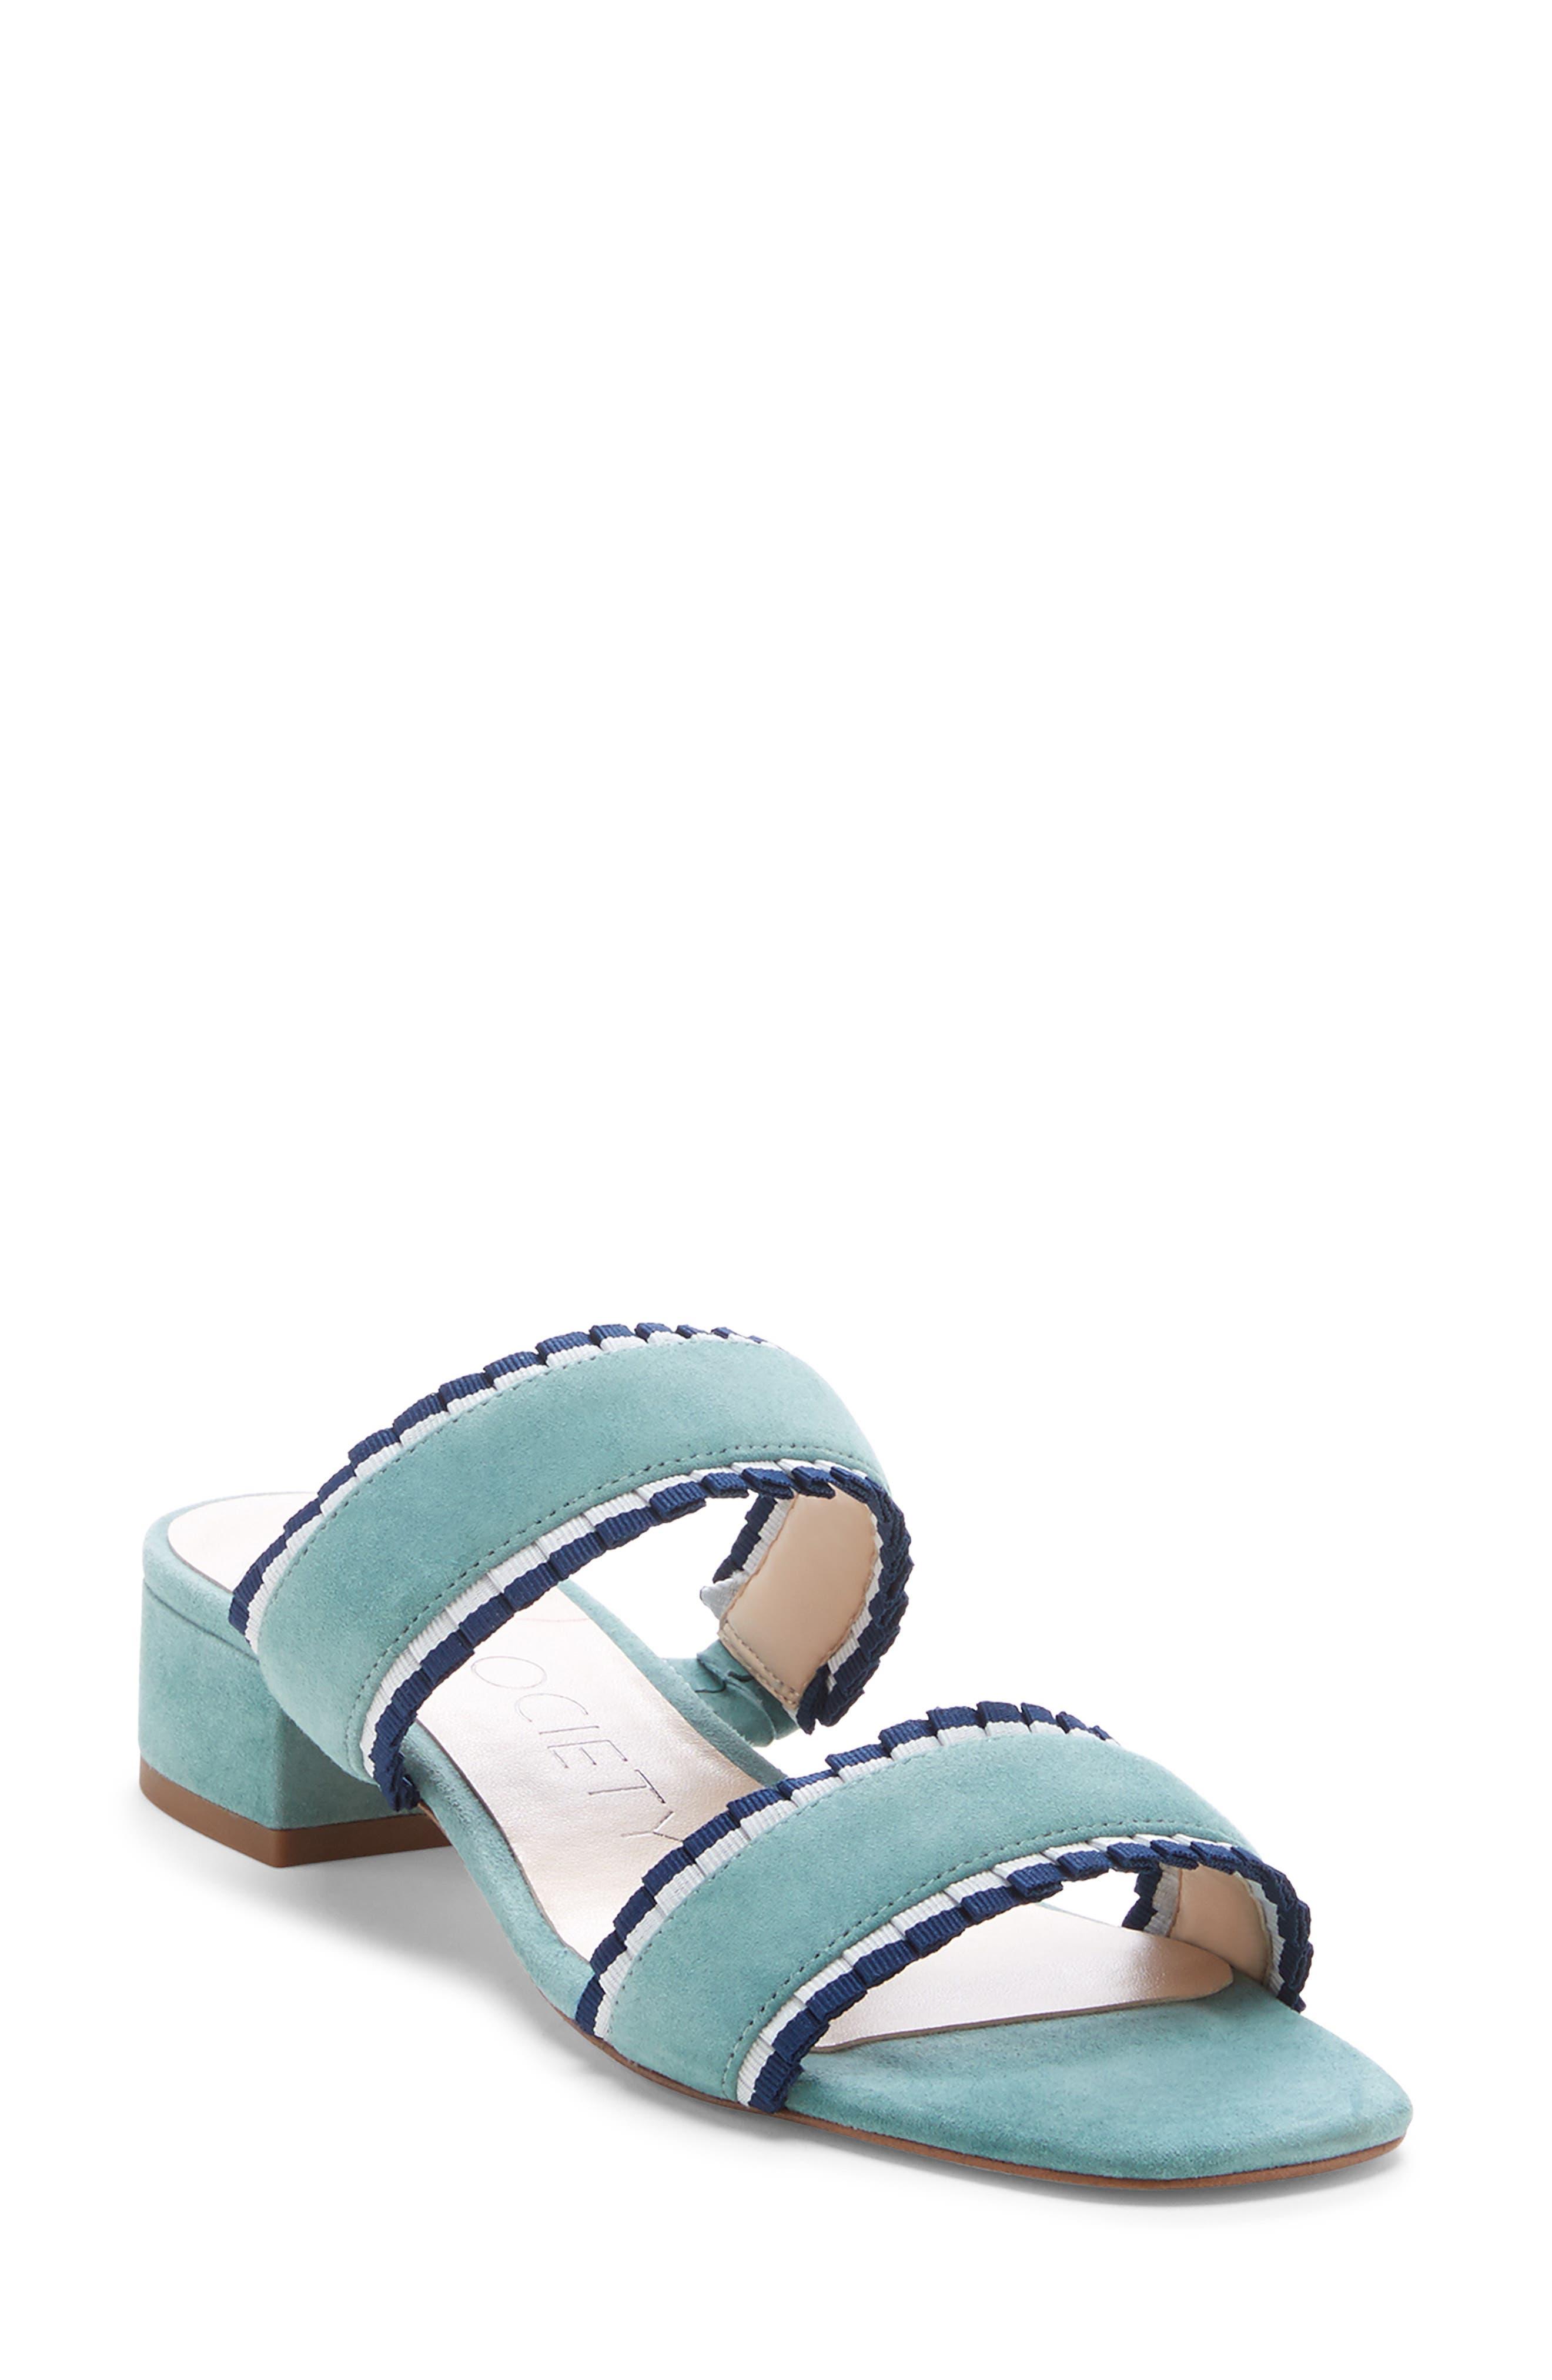 Elura Slide Sandal, Main, color, LIGHT SEA GREEN SUEDE